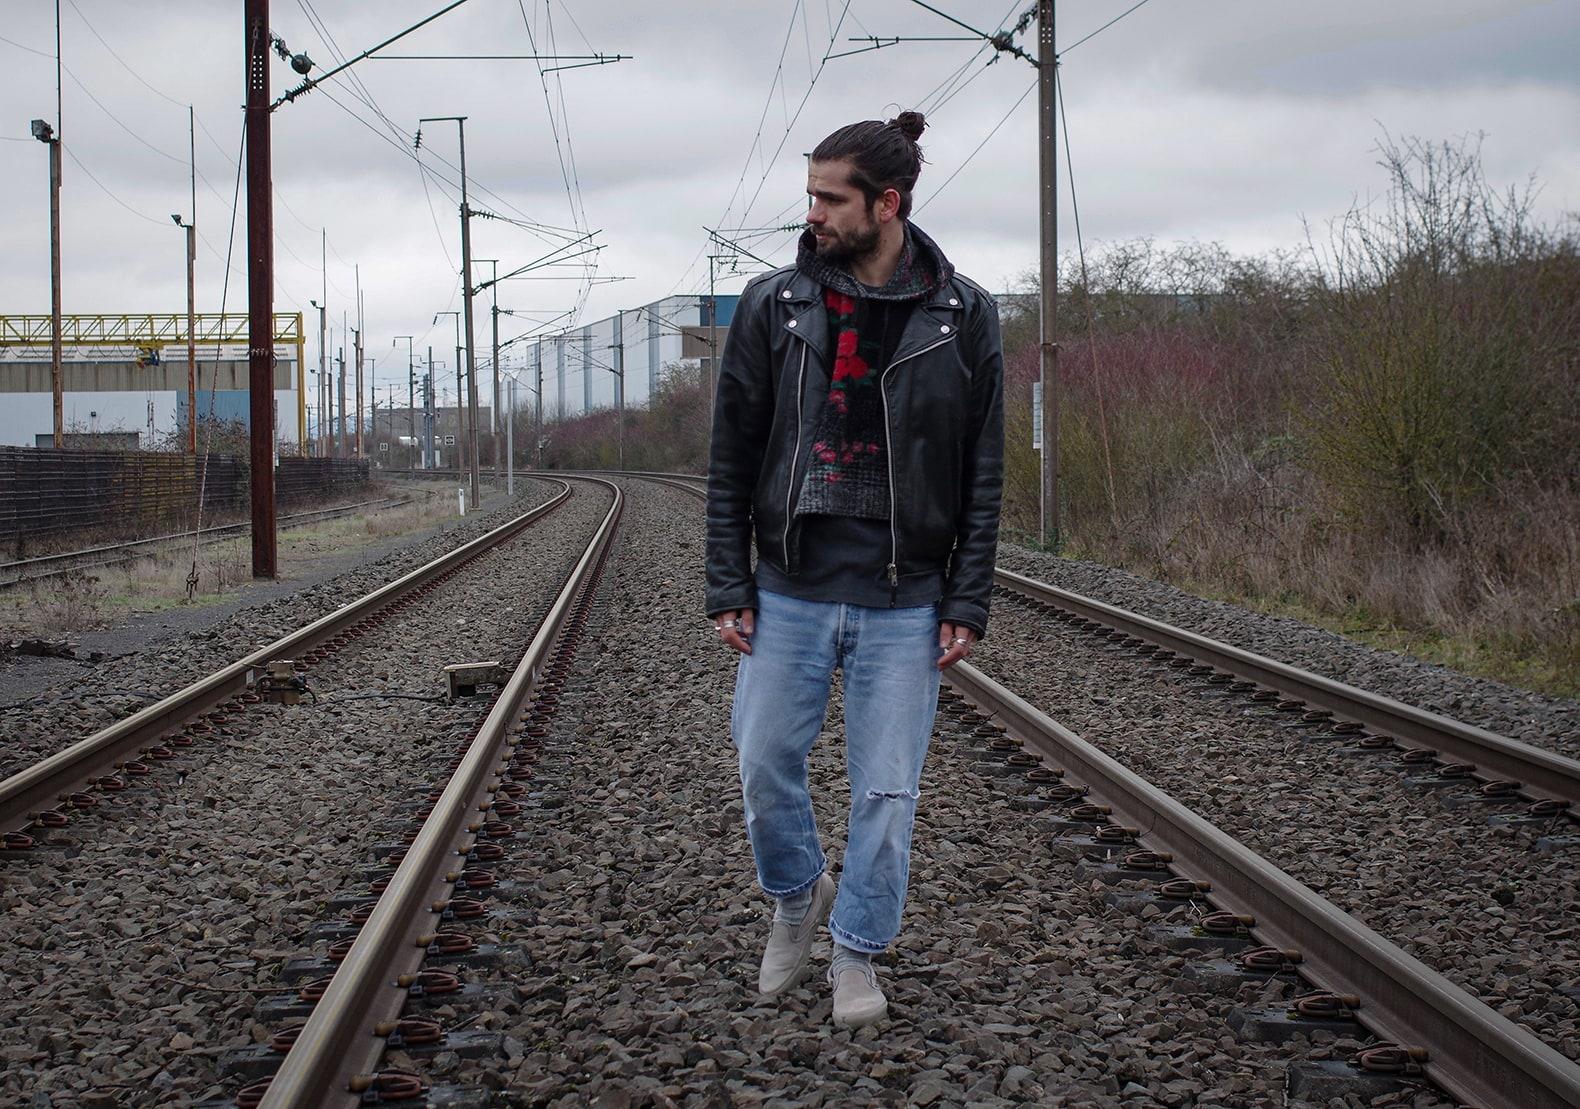 idée de tenue avec un perfecto : le jean levi's 501